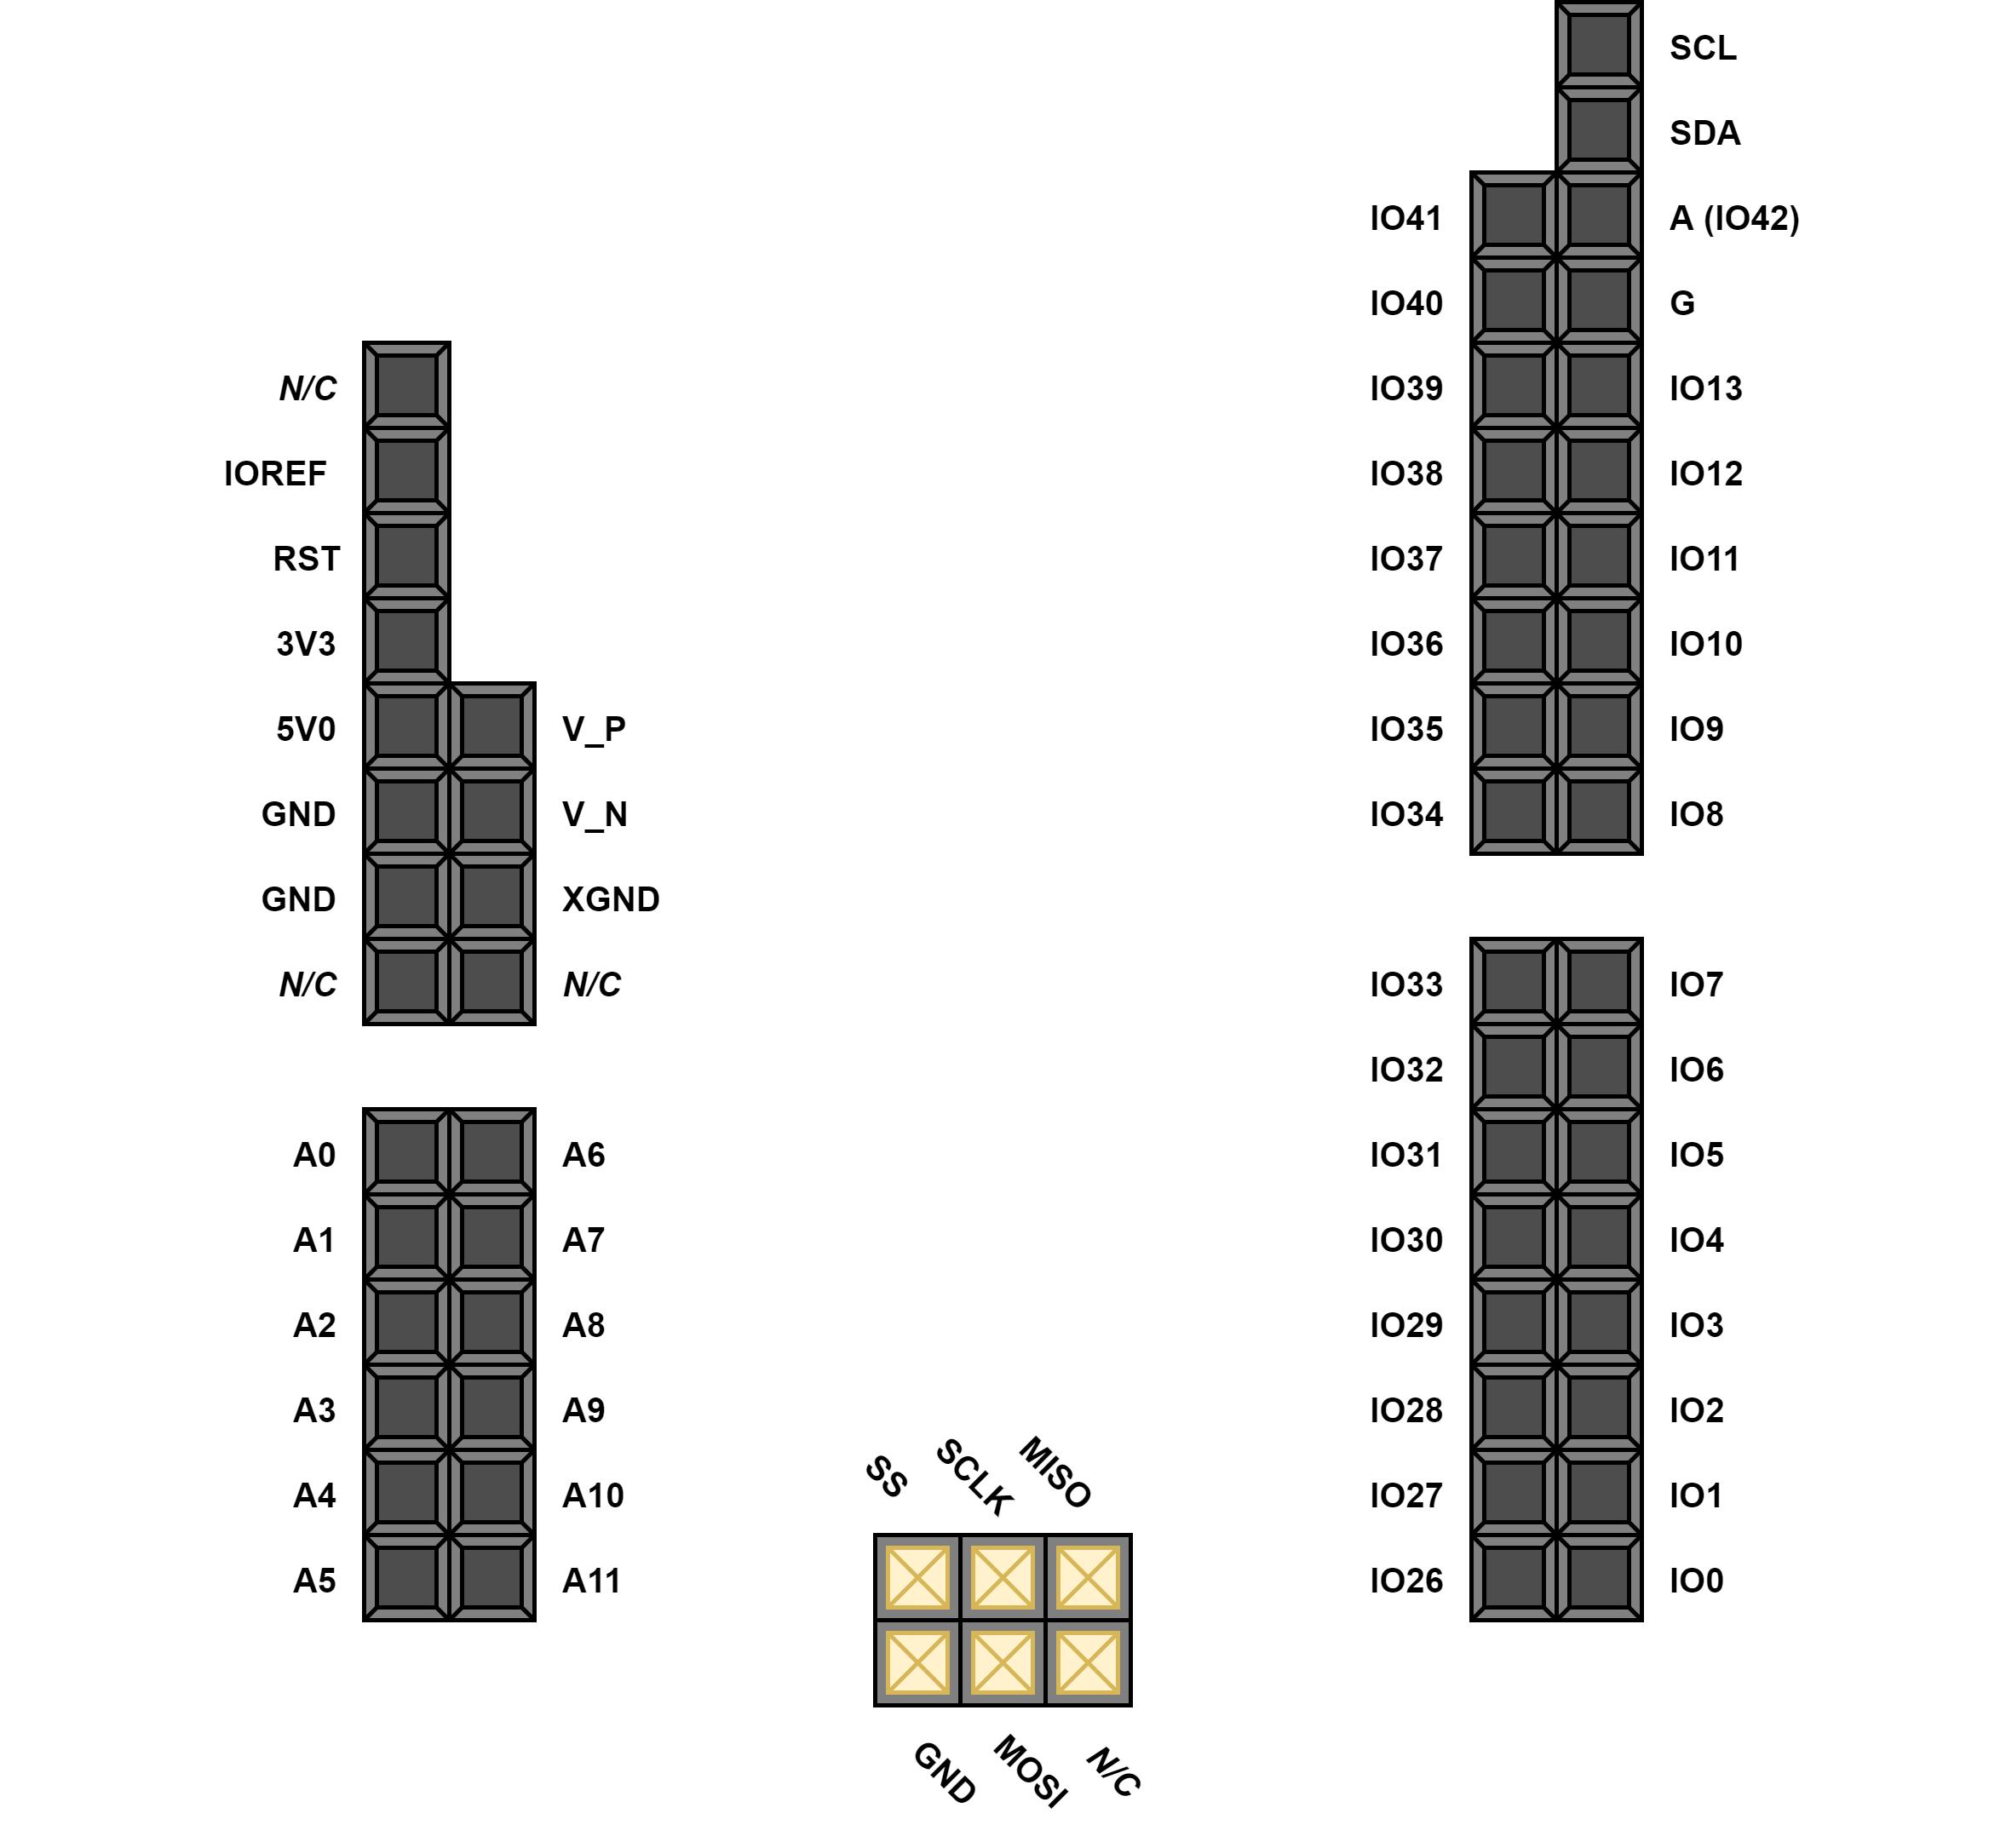 reference:programmable-logic:cora-z7:cora-shield.png